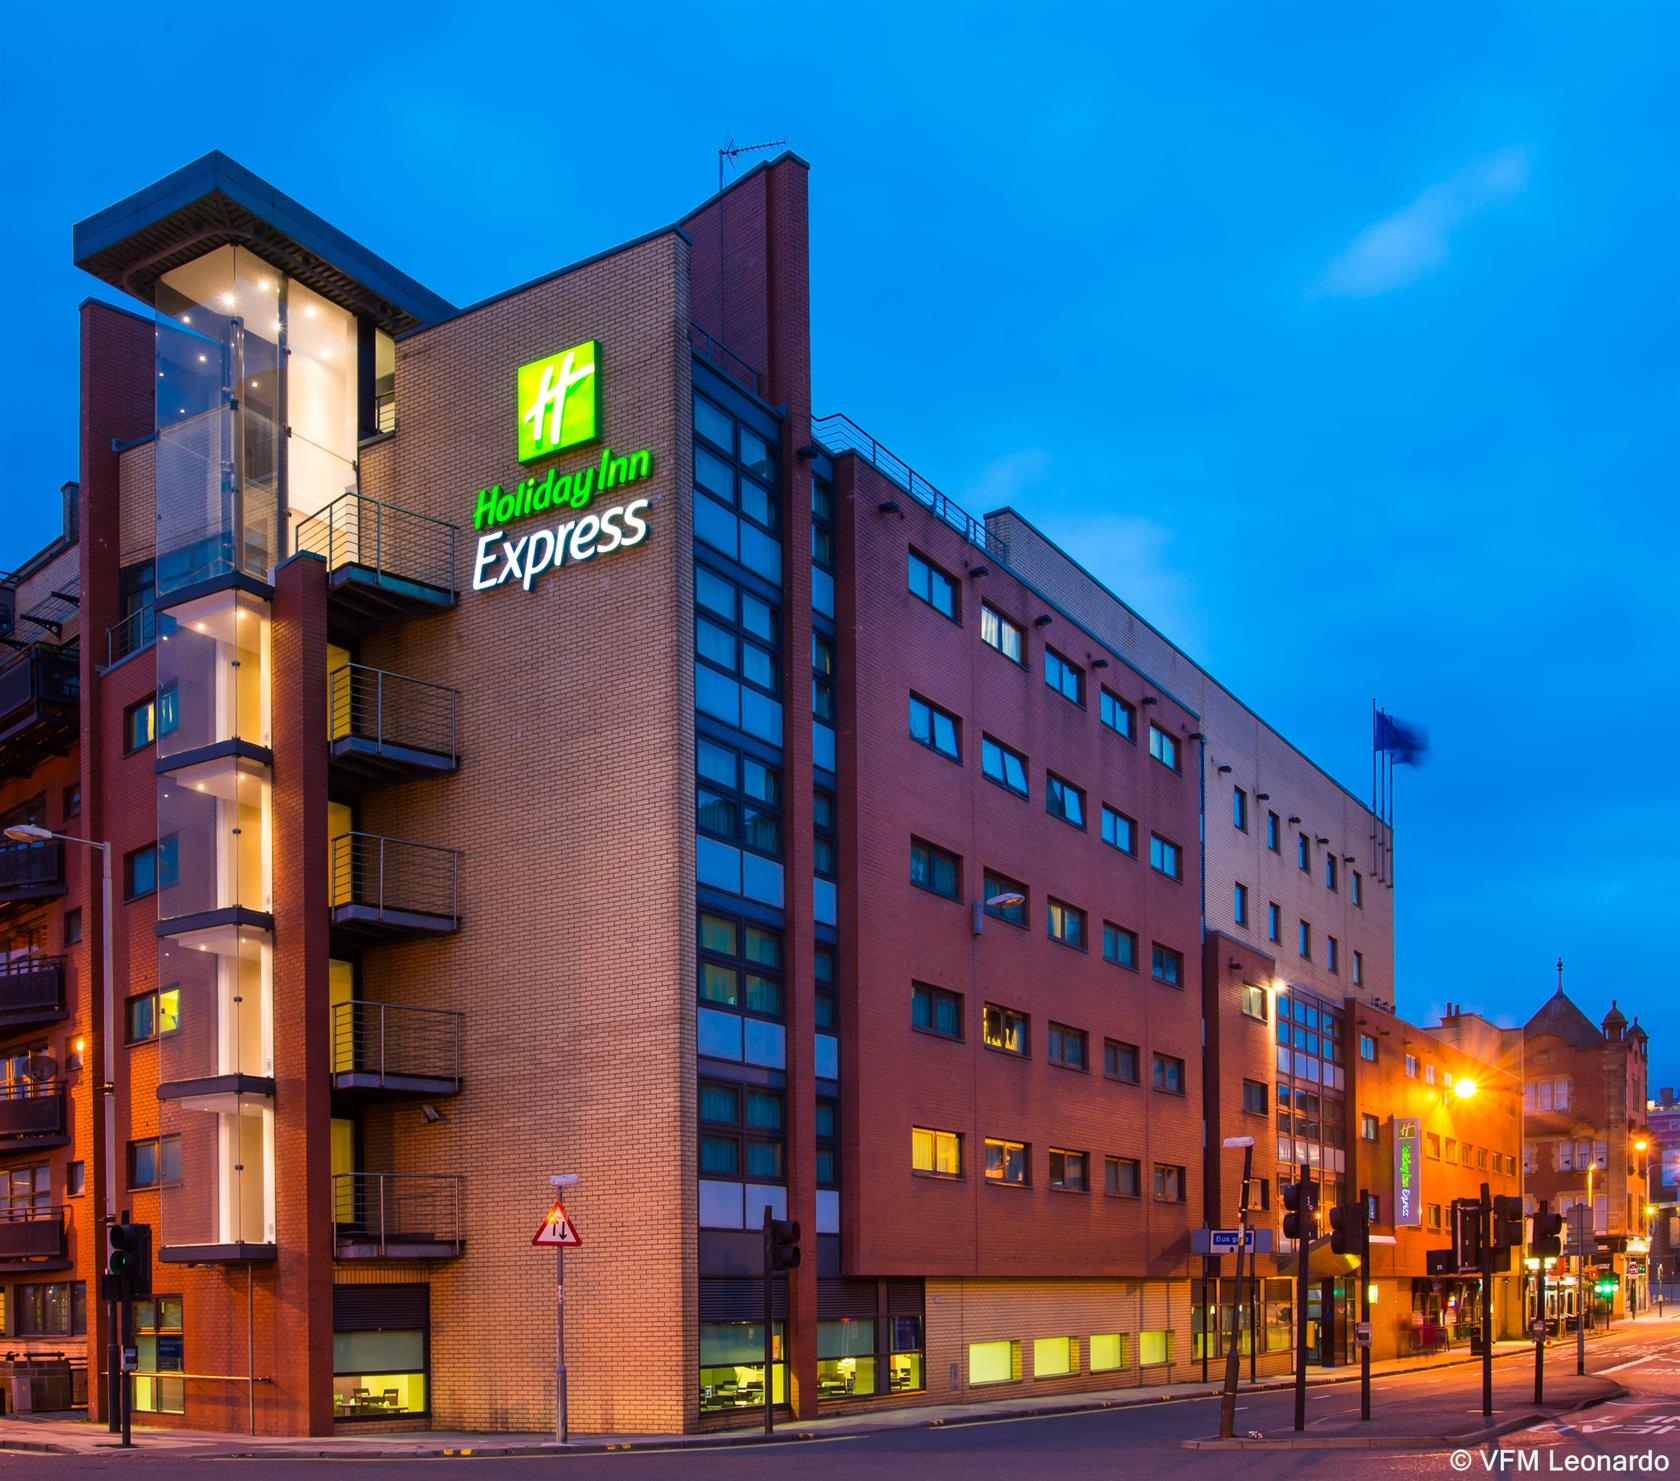 Hotel Express Holiday Inn Riverside